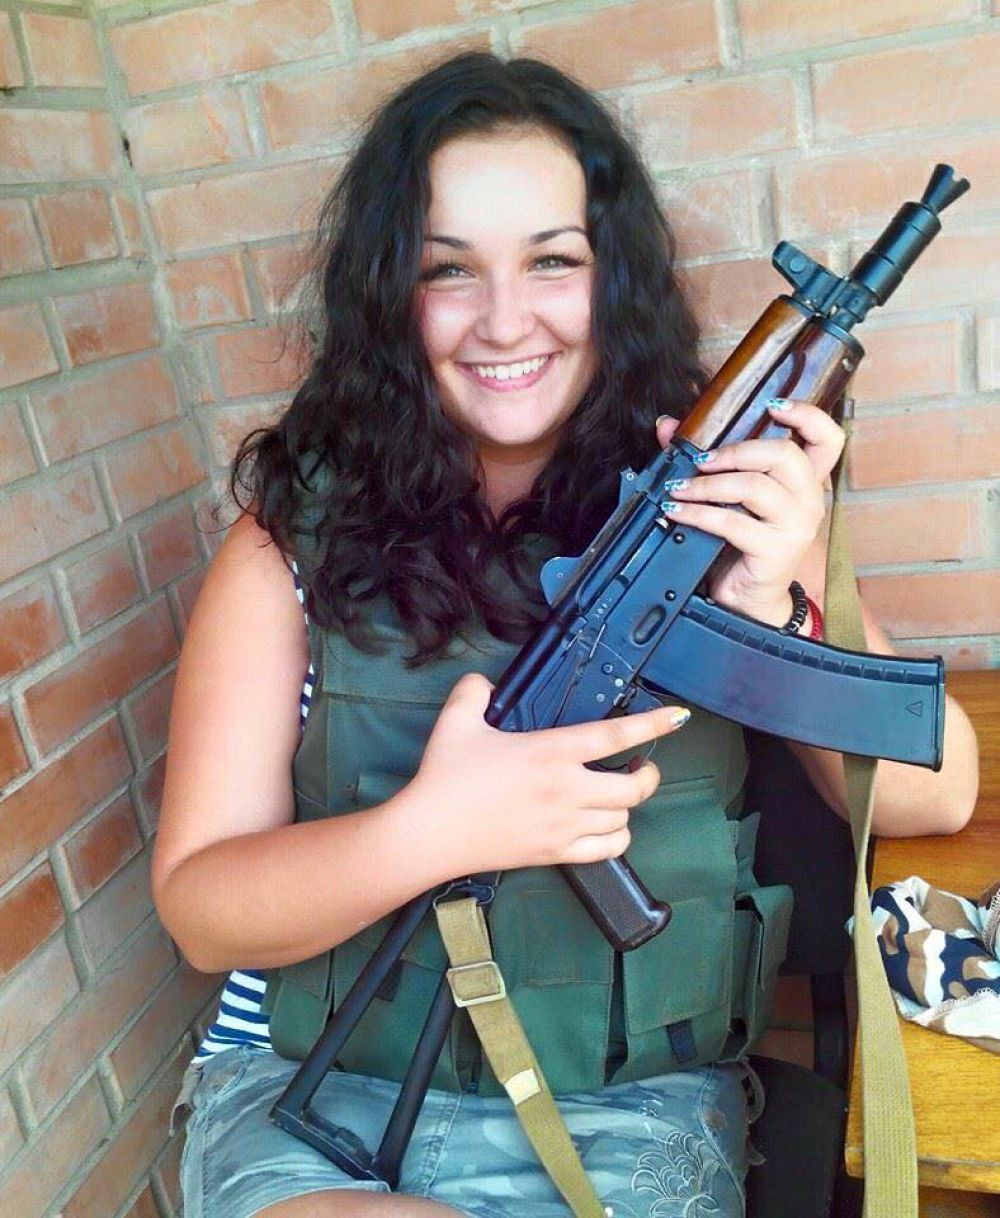 Волонтер Татьяна Дюрдь